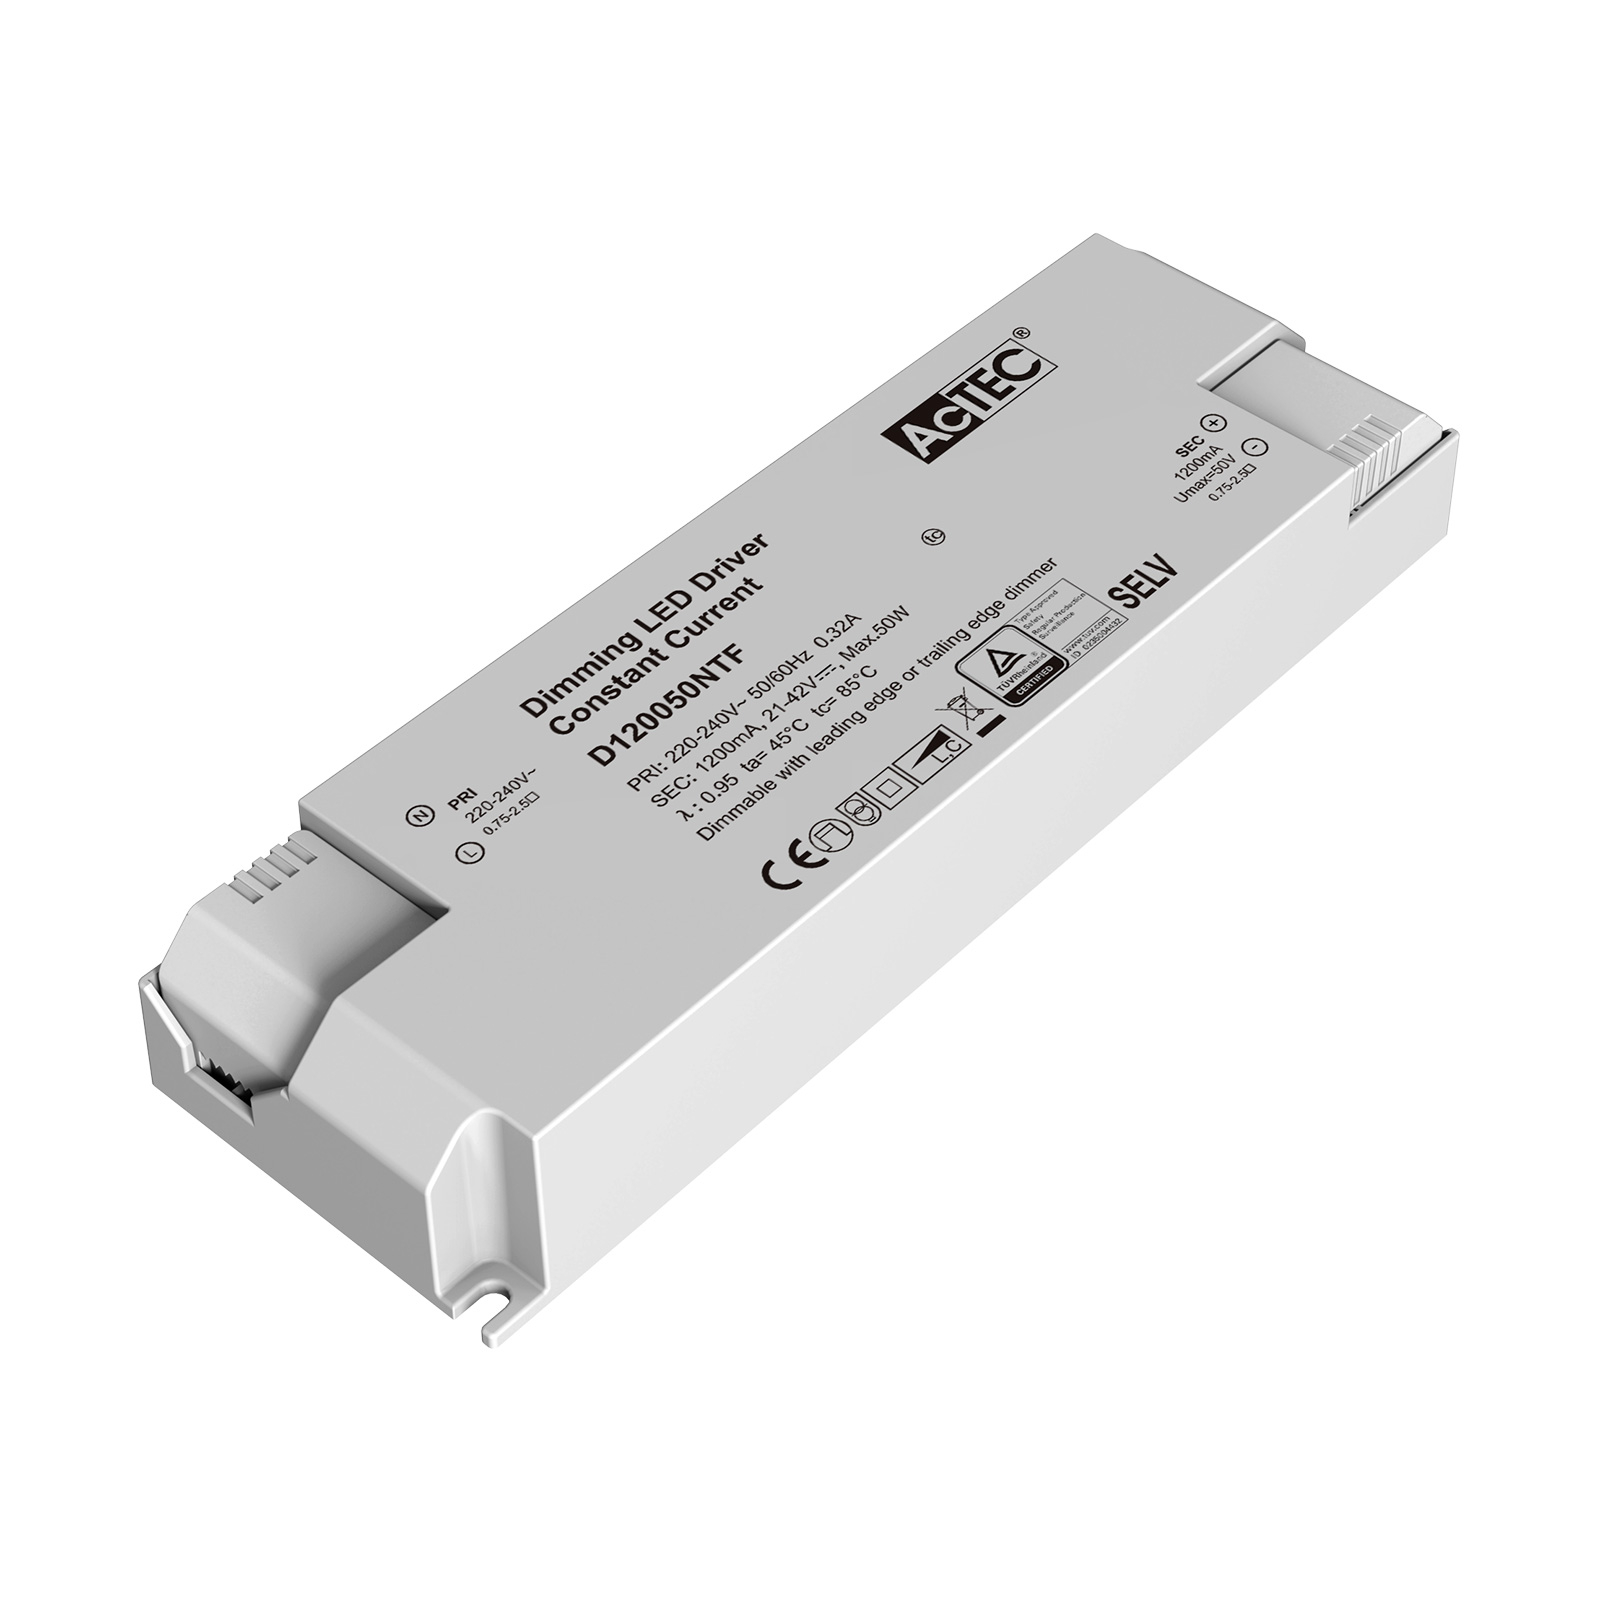 AcTEC Triac LED-driver CC maks. 50W 1200mA